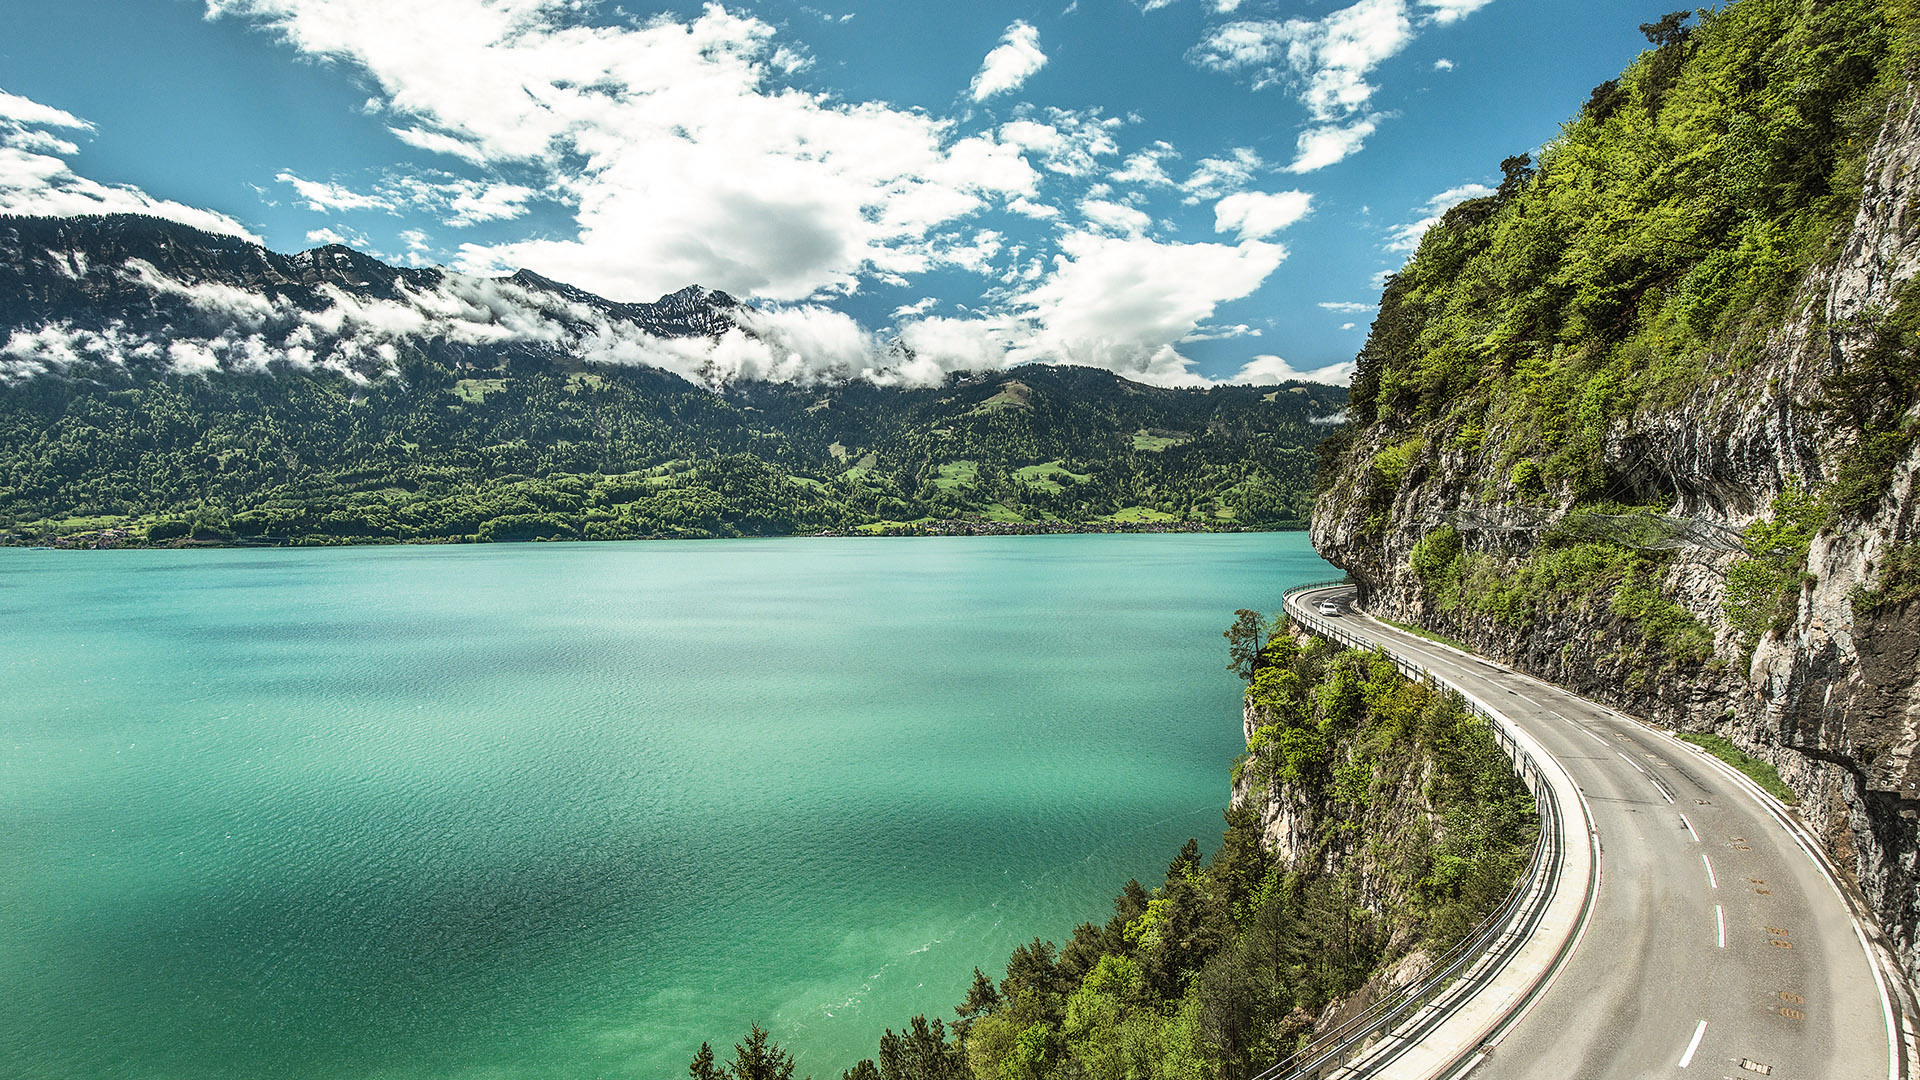 Tourabschnitt 7 - Zermatt-Neuchâtel